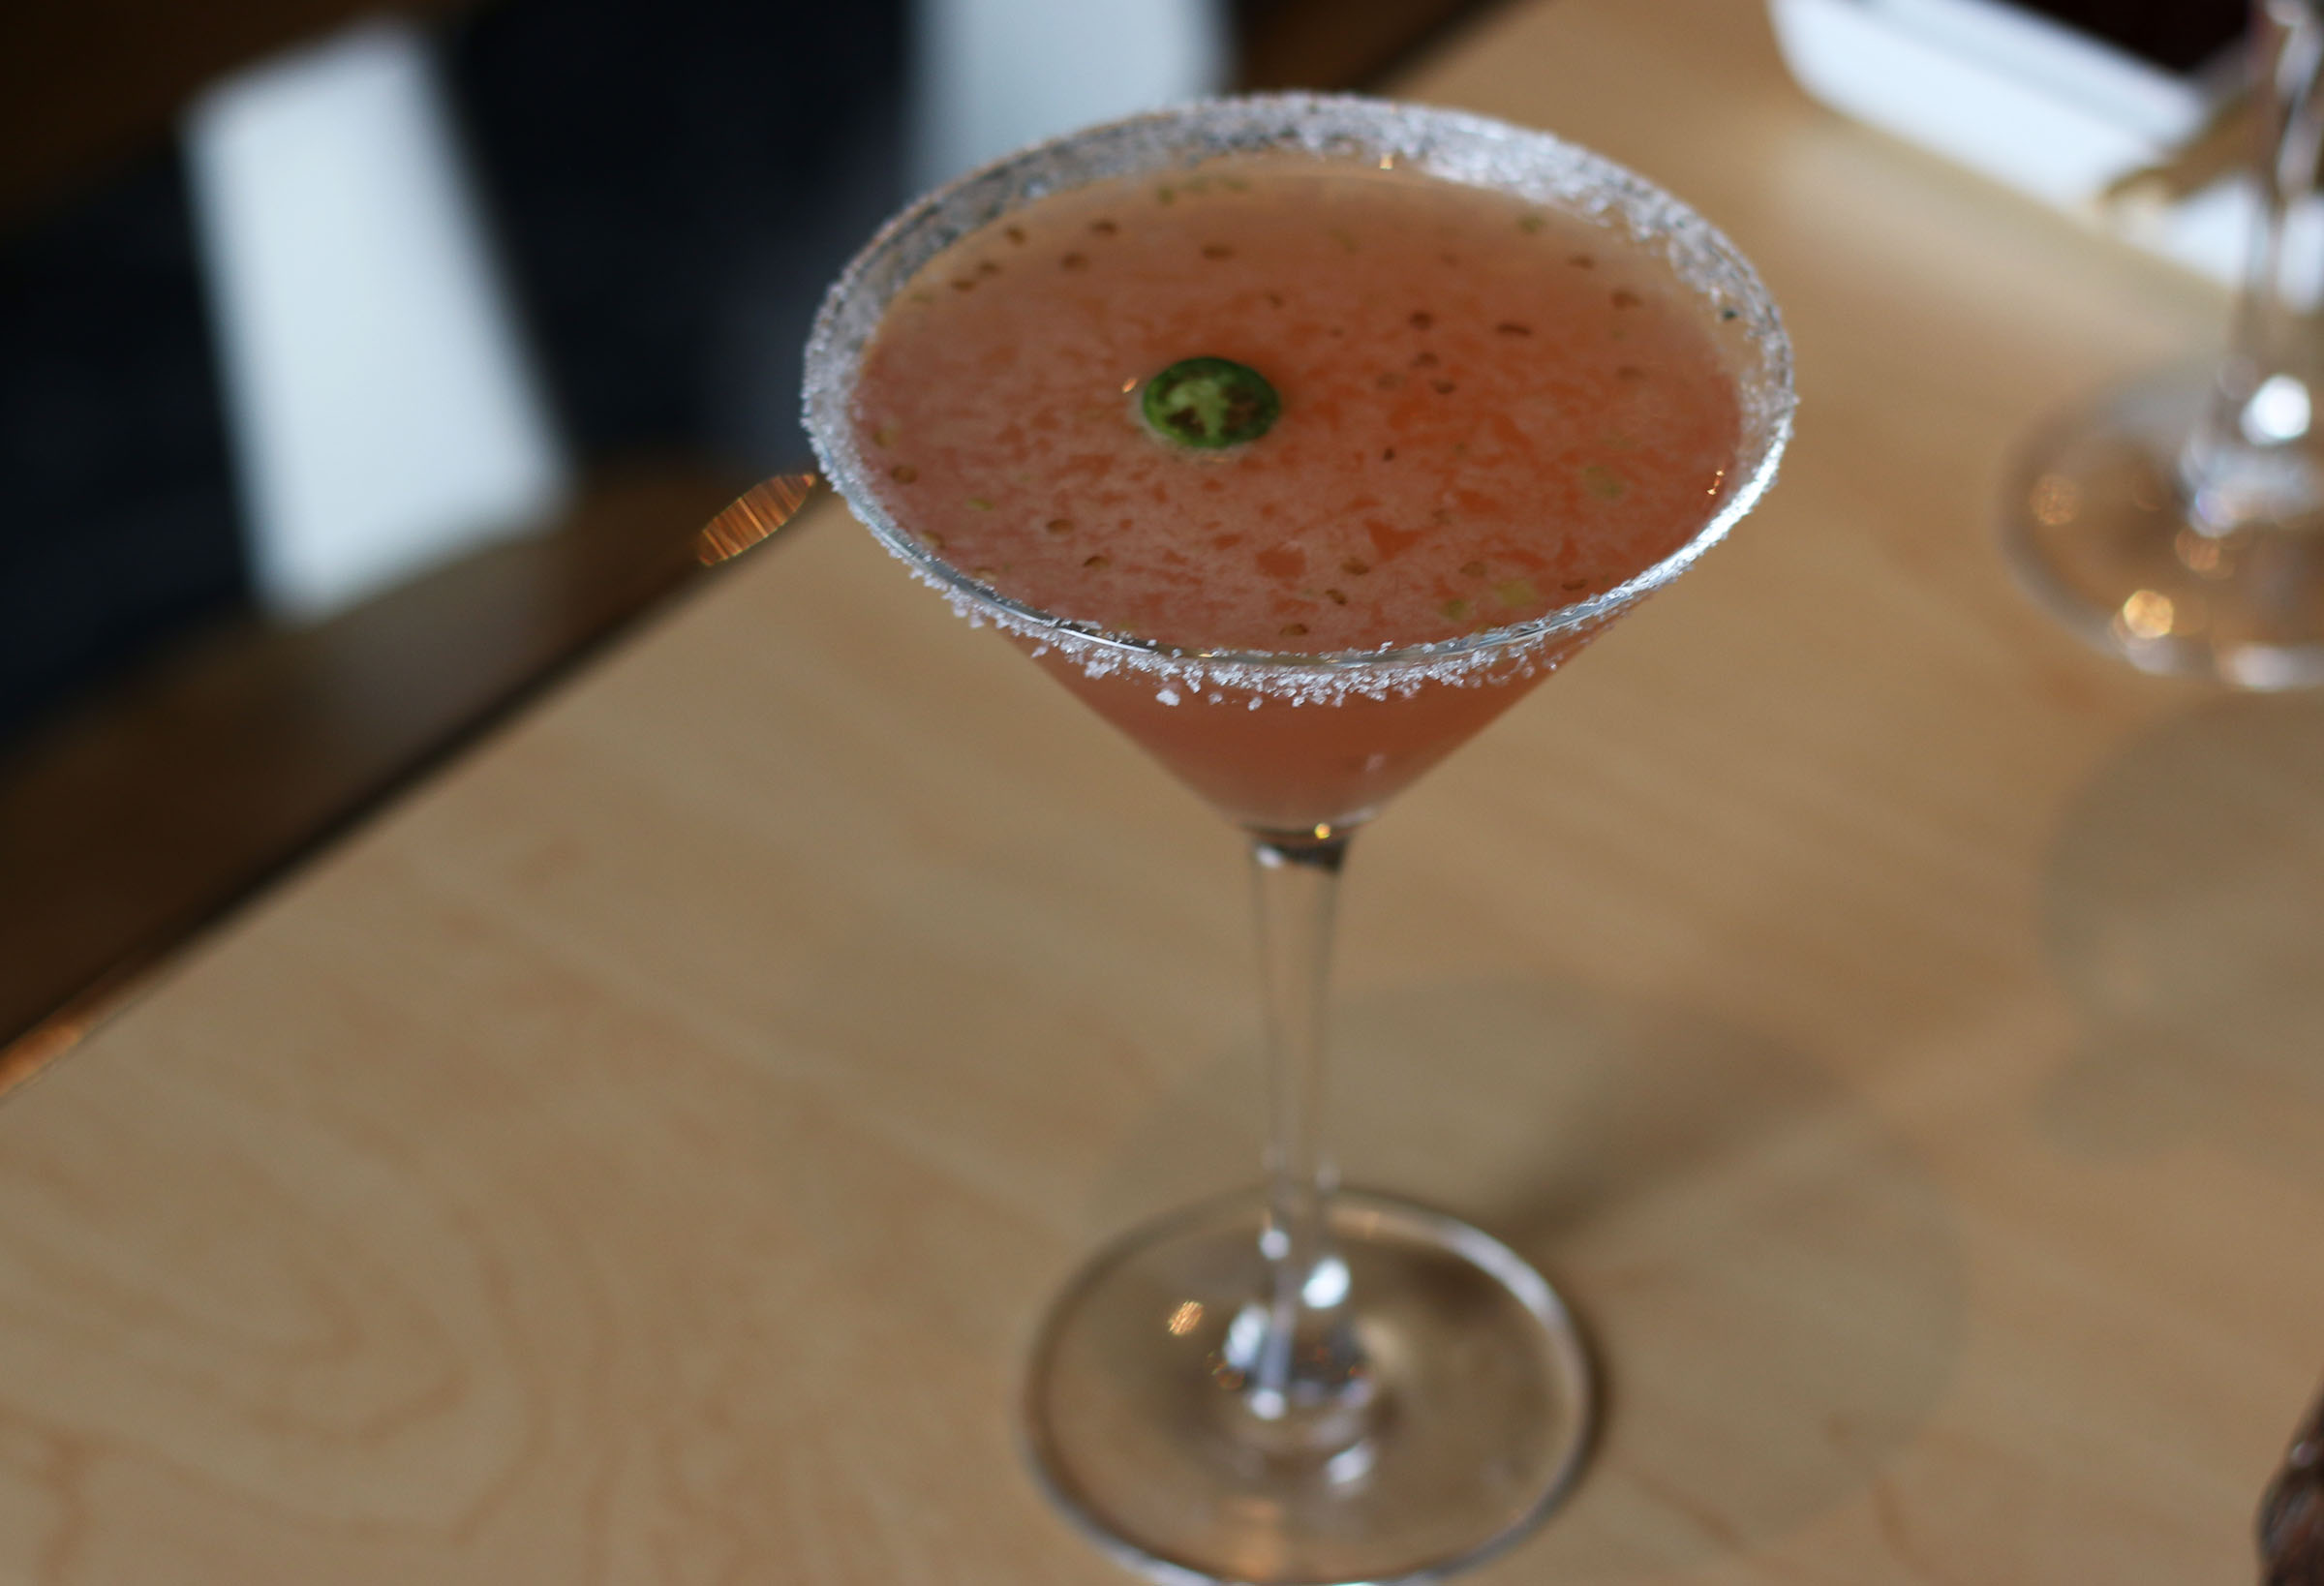 BURNING MANDARIN: Absolut Mandarin Vodka, hand-crushed serrano chili, fresh lemon and orange juice with a splash of cranberry.